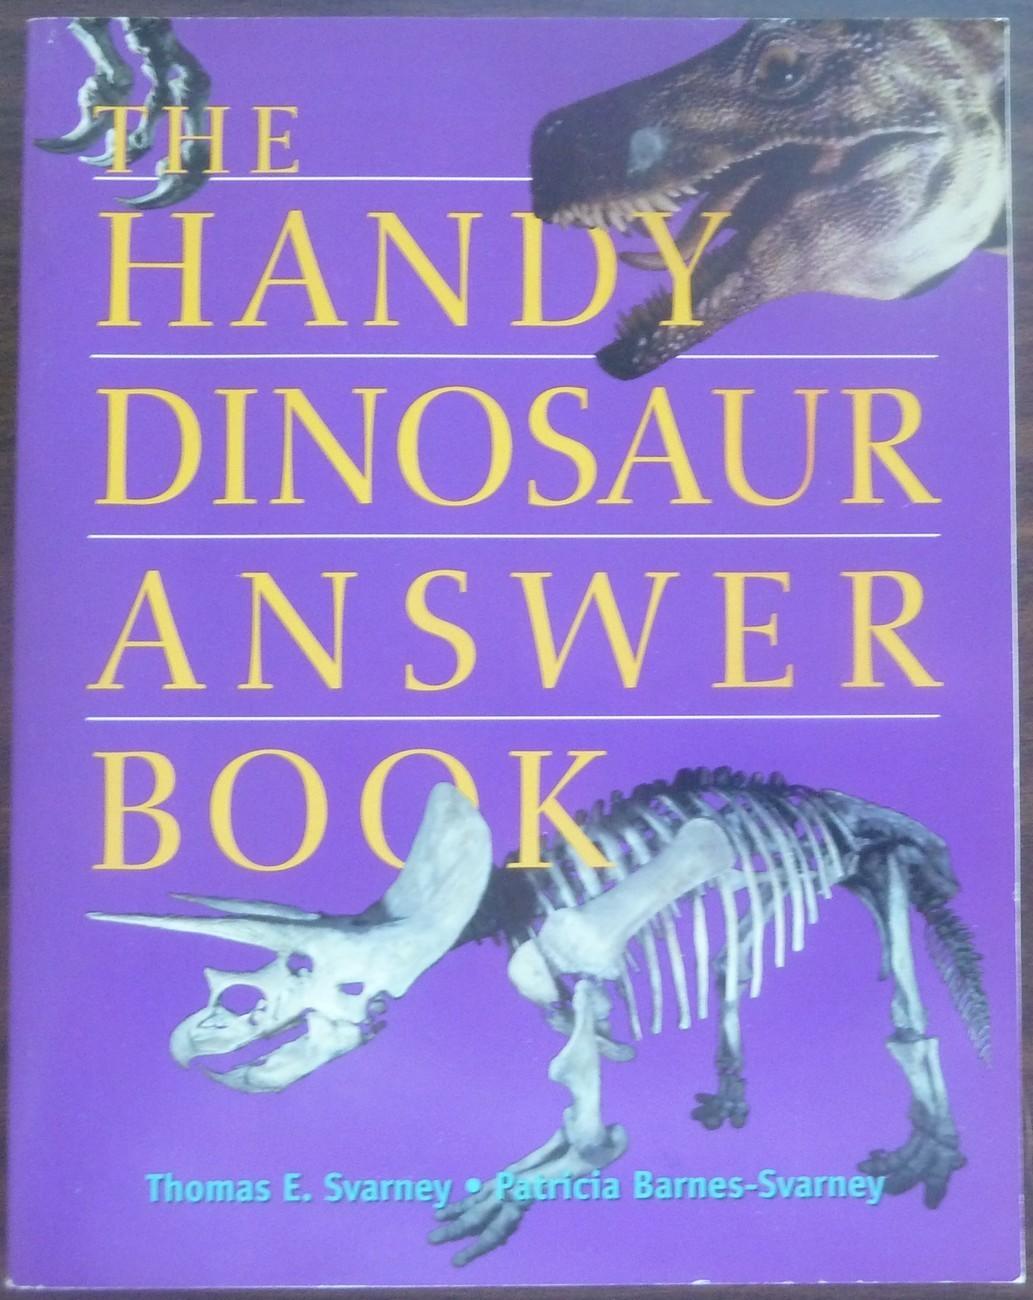 The Handy Dinosaur Answer Book by Thomas E Svarney